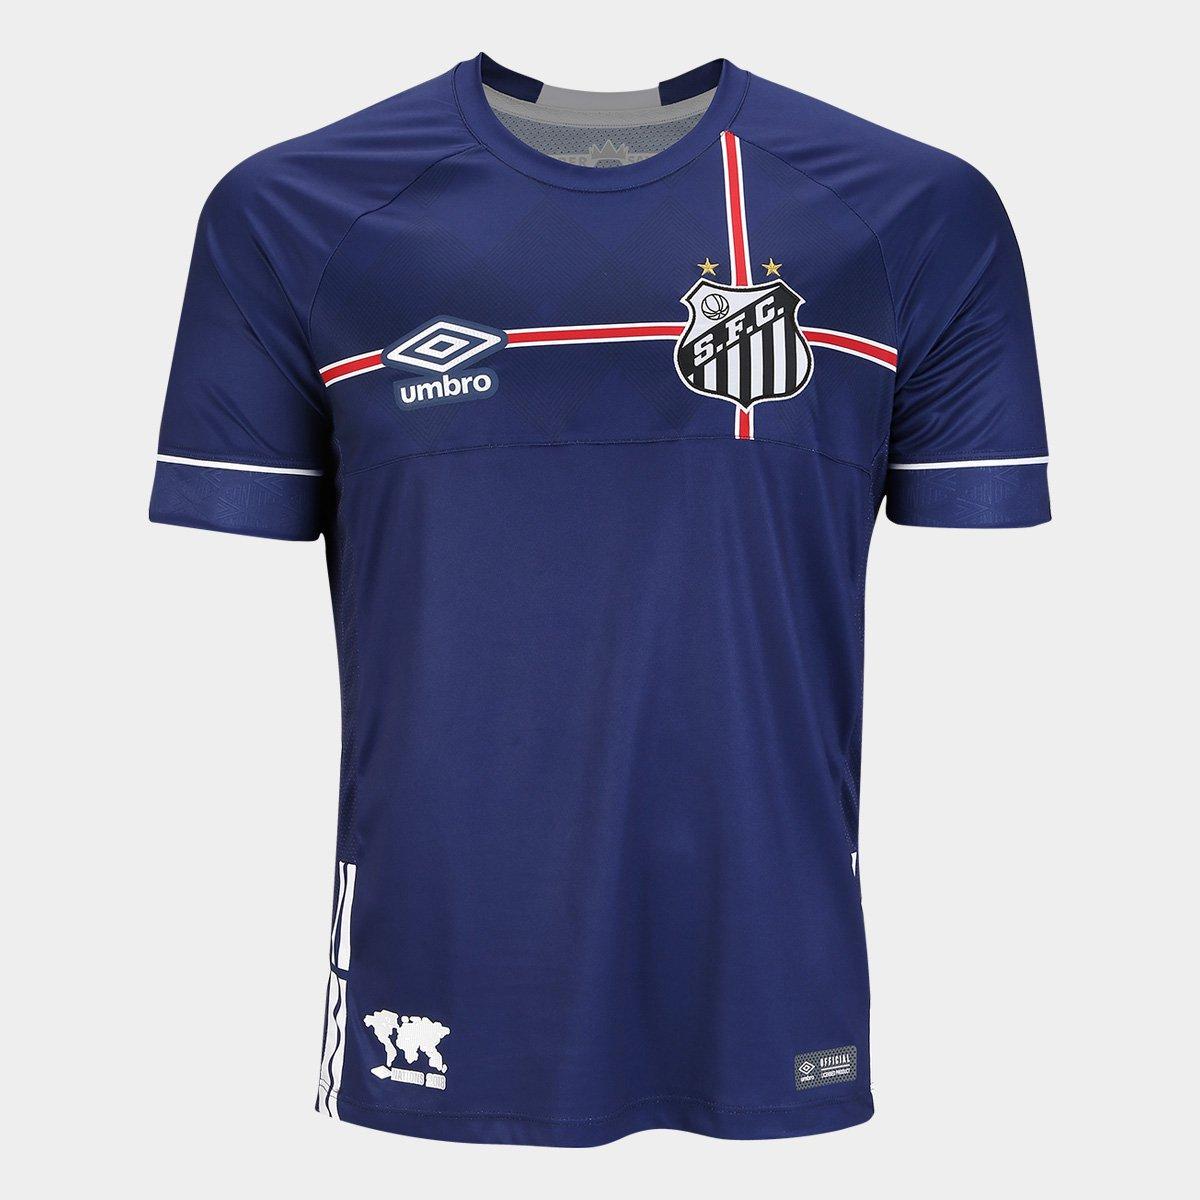 b521a6296f Camisa Santos 2018 s n° The Kingdom - Torcedor Umbro Masculina ...